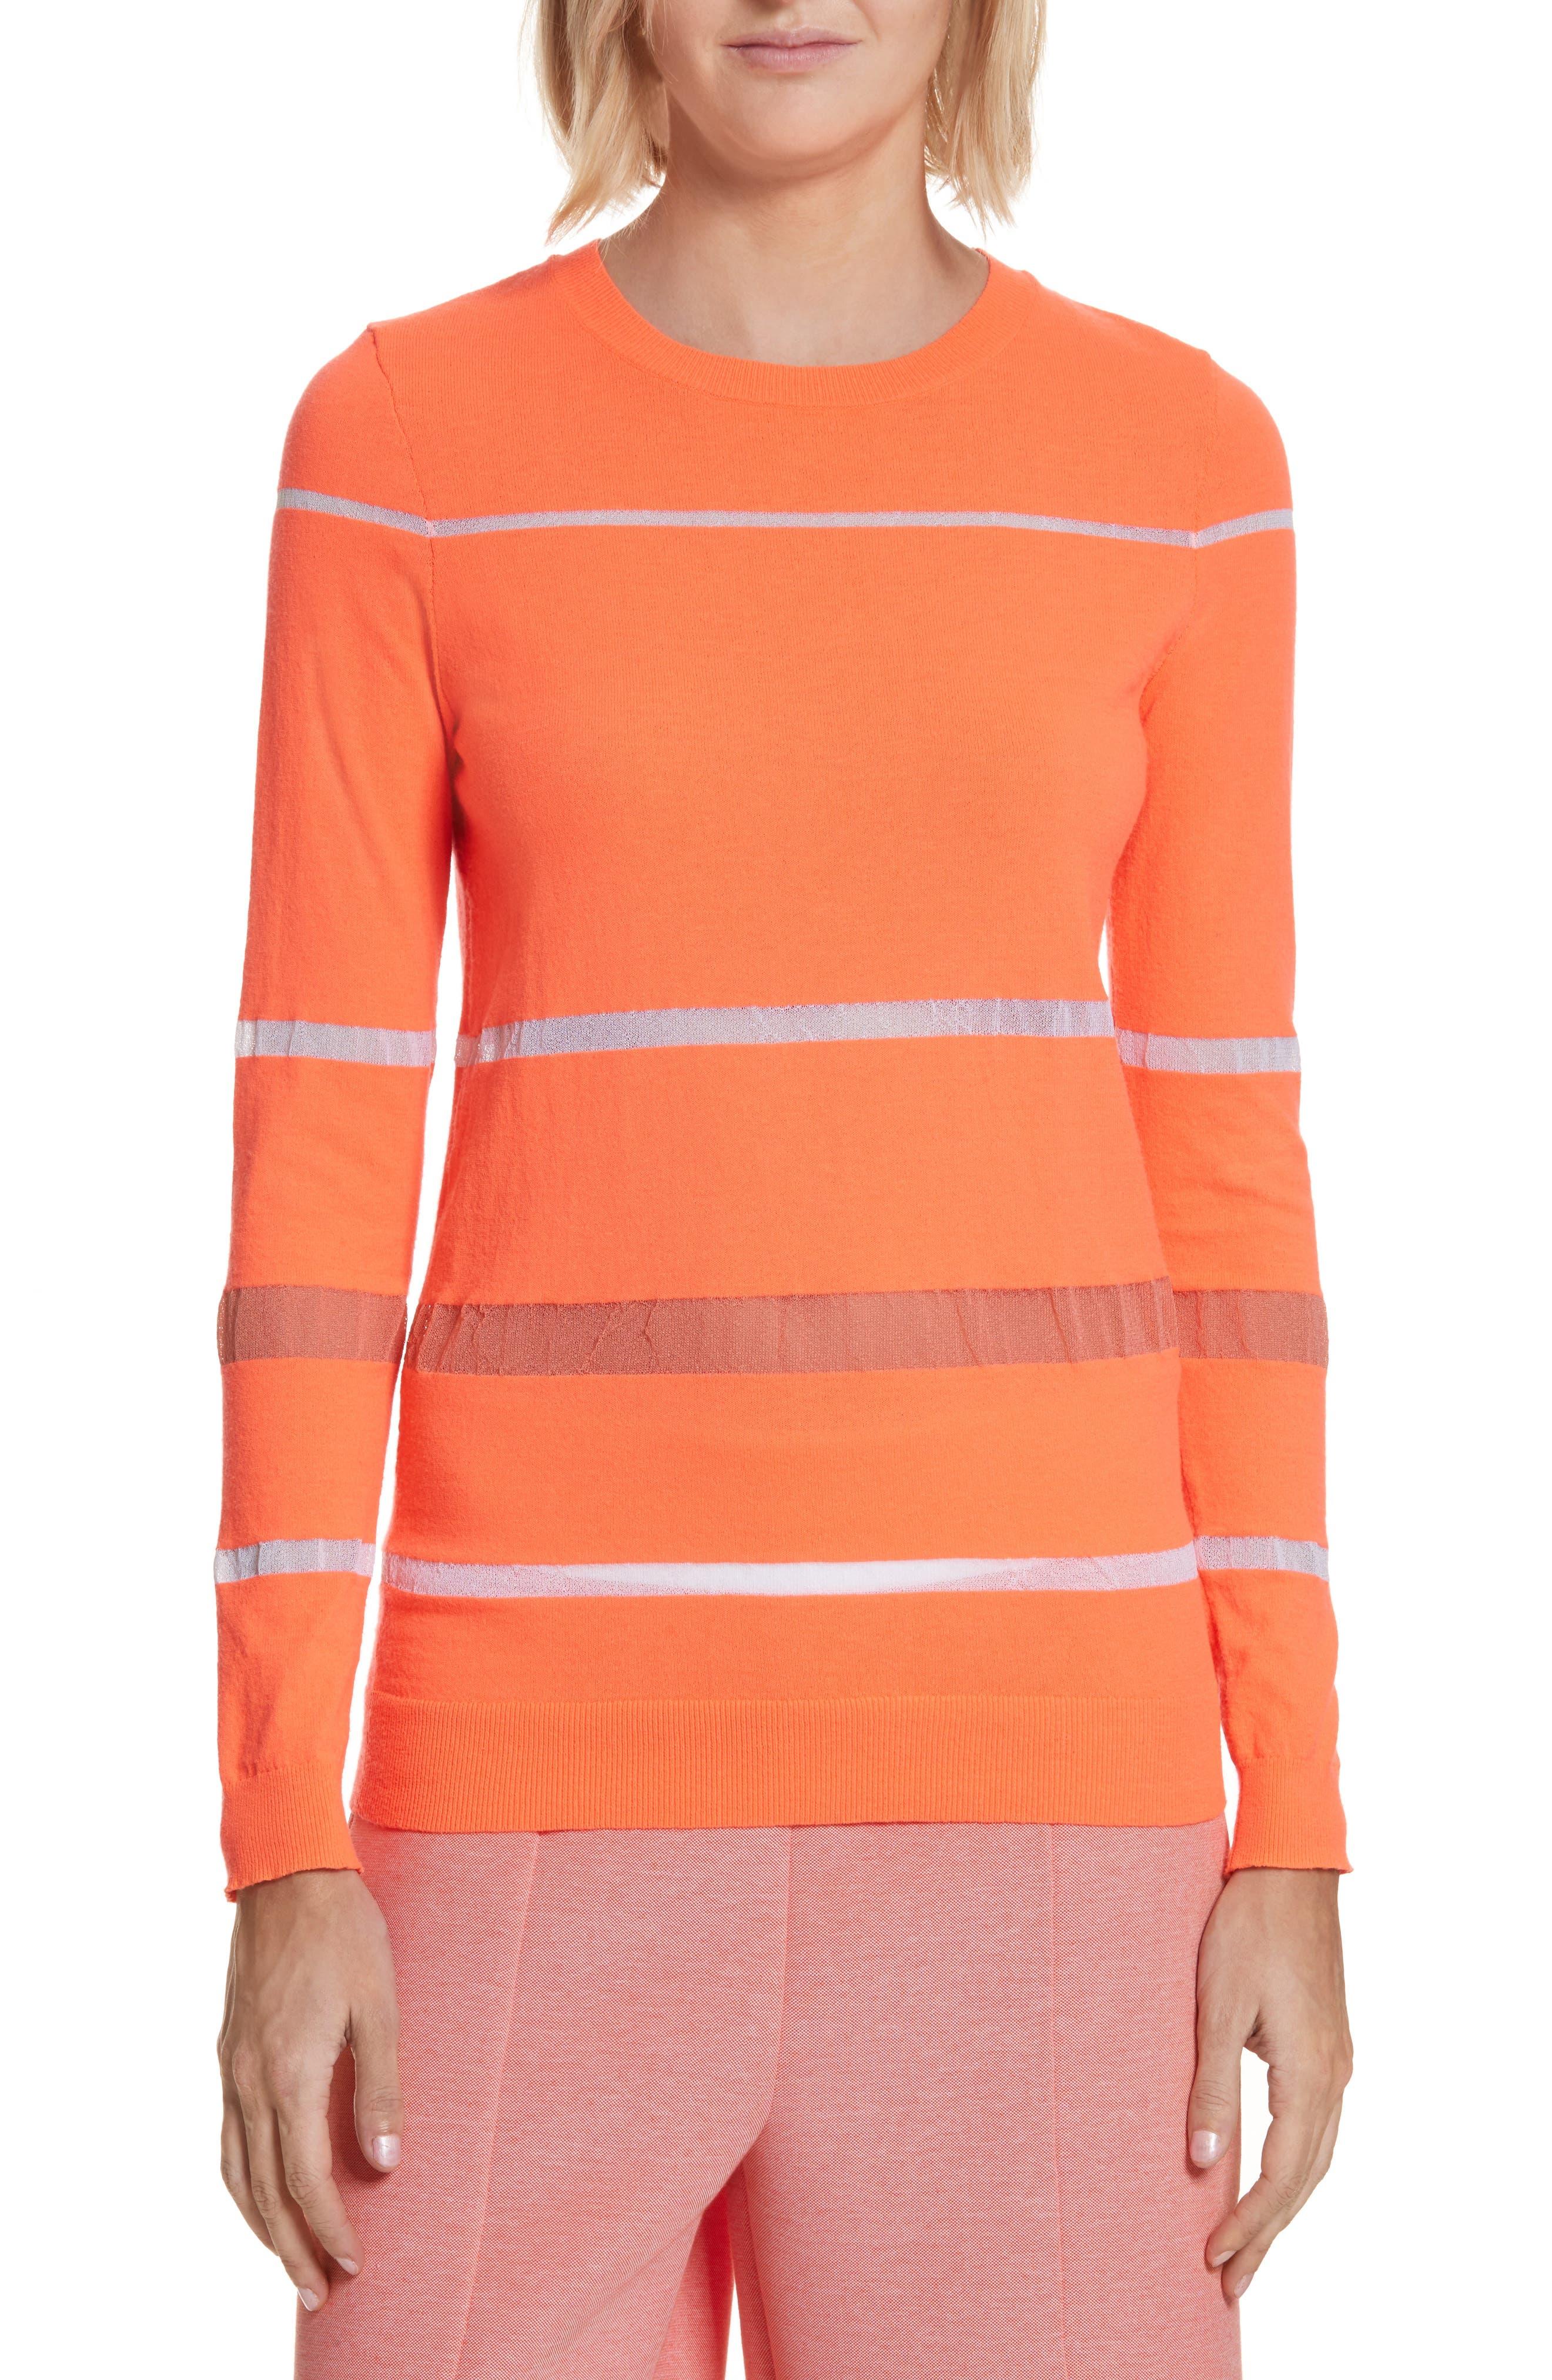 Main Image - Neverbefore Illusion Stripe Crewneck Sweater